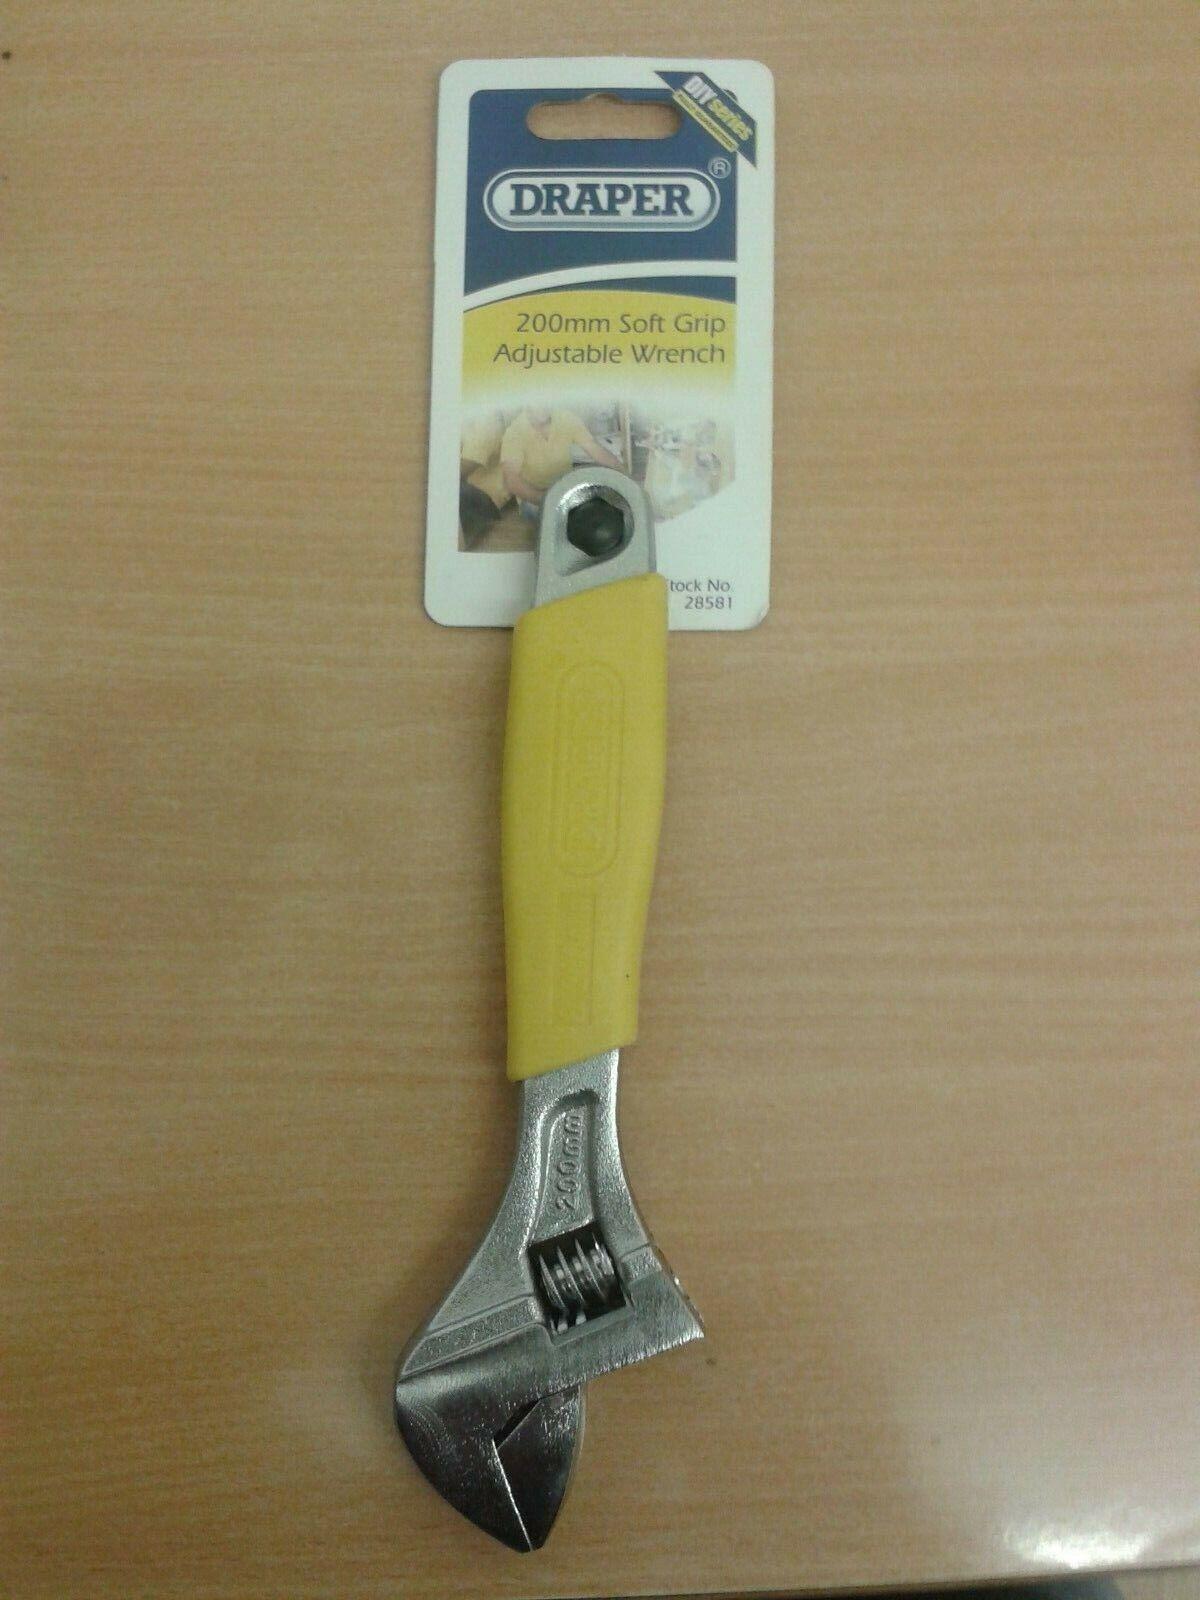 Draper Expert 200mm Soft Grip Crescent-Type Wrench 24894